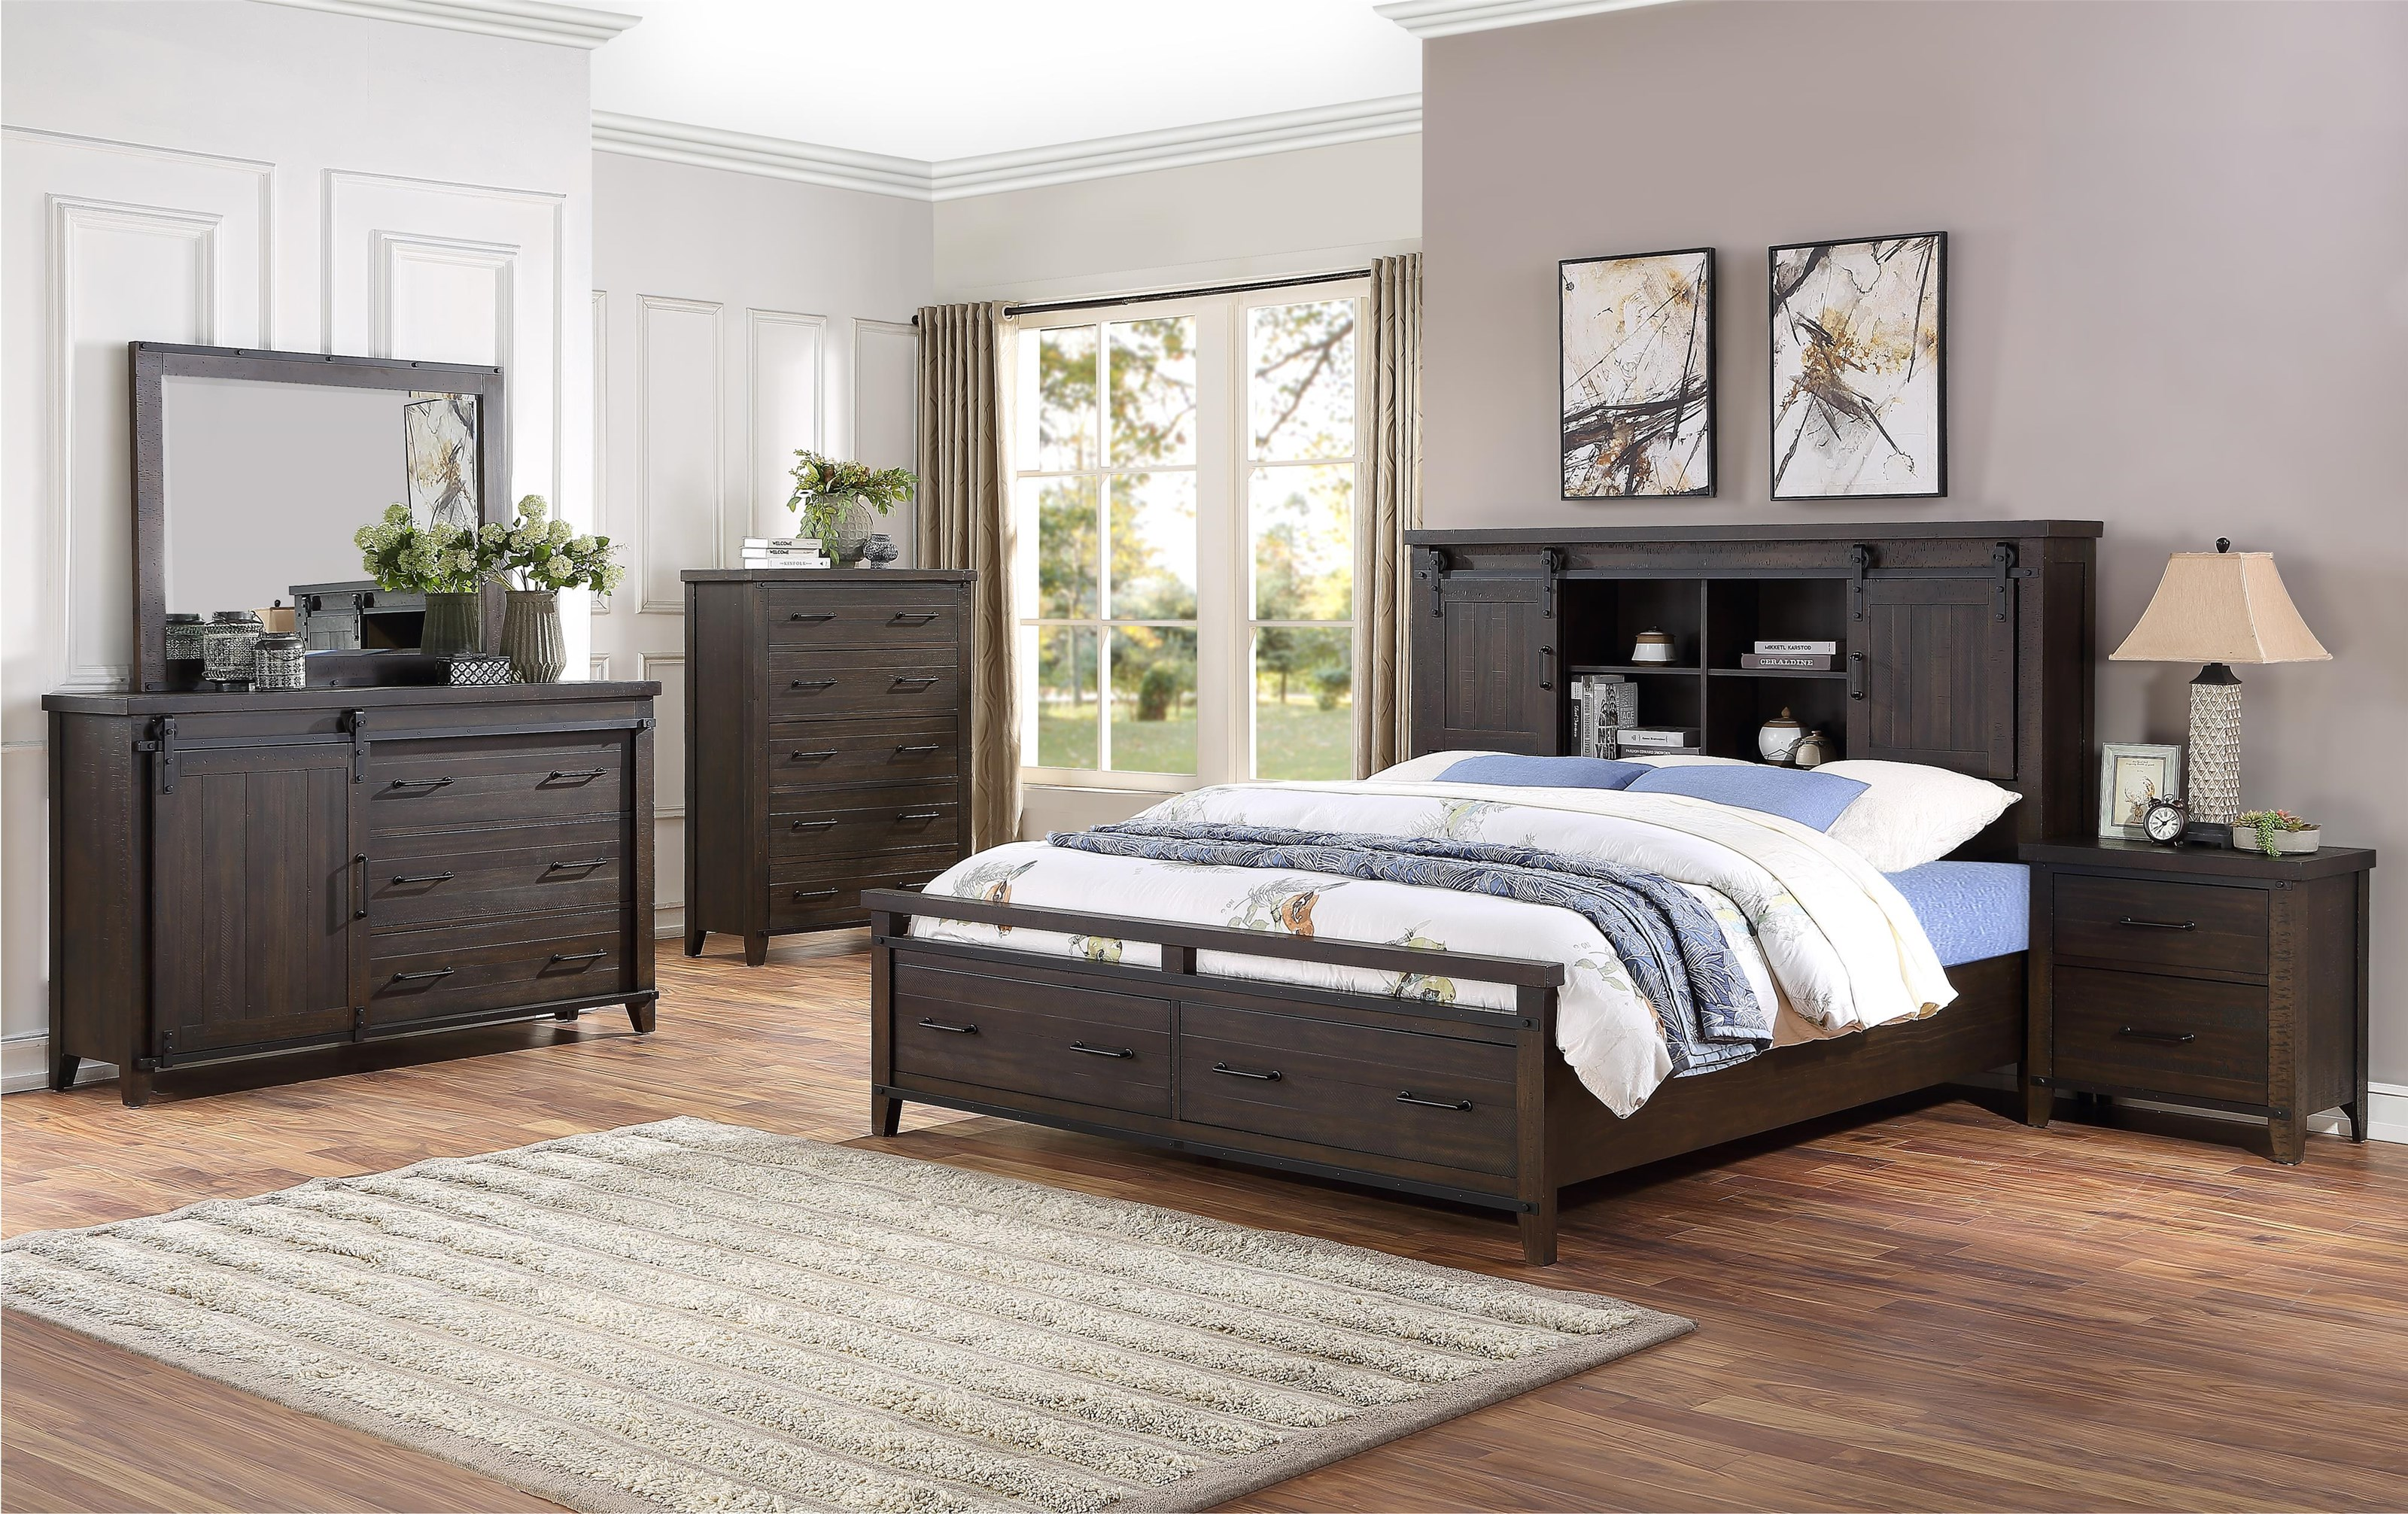 Durango 5 Piece Queen Storage Bedroom Group by HH at Walker's Furniture